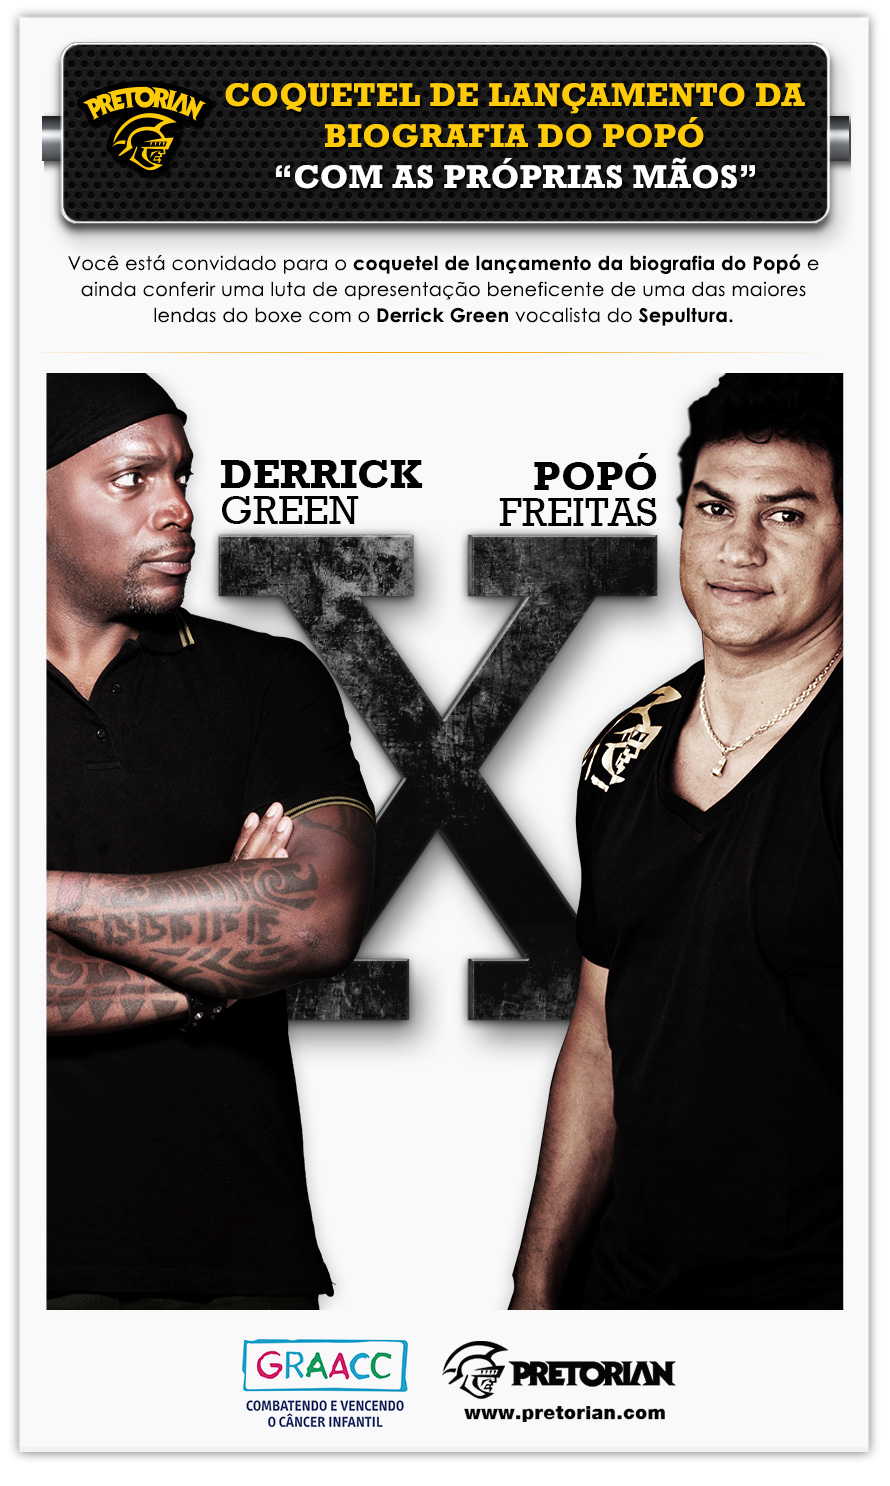 EMAILMKT-Desafio-Popo-vs-Derrick-ALTA